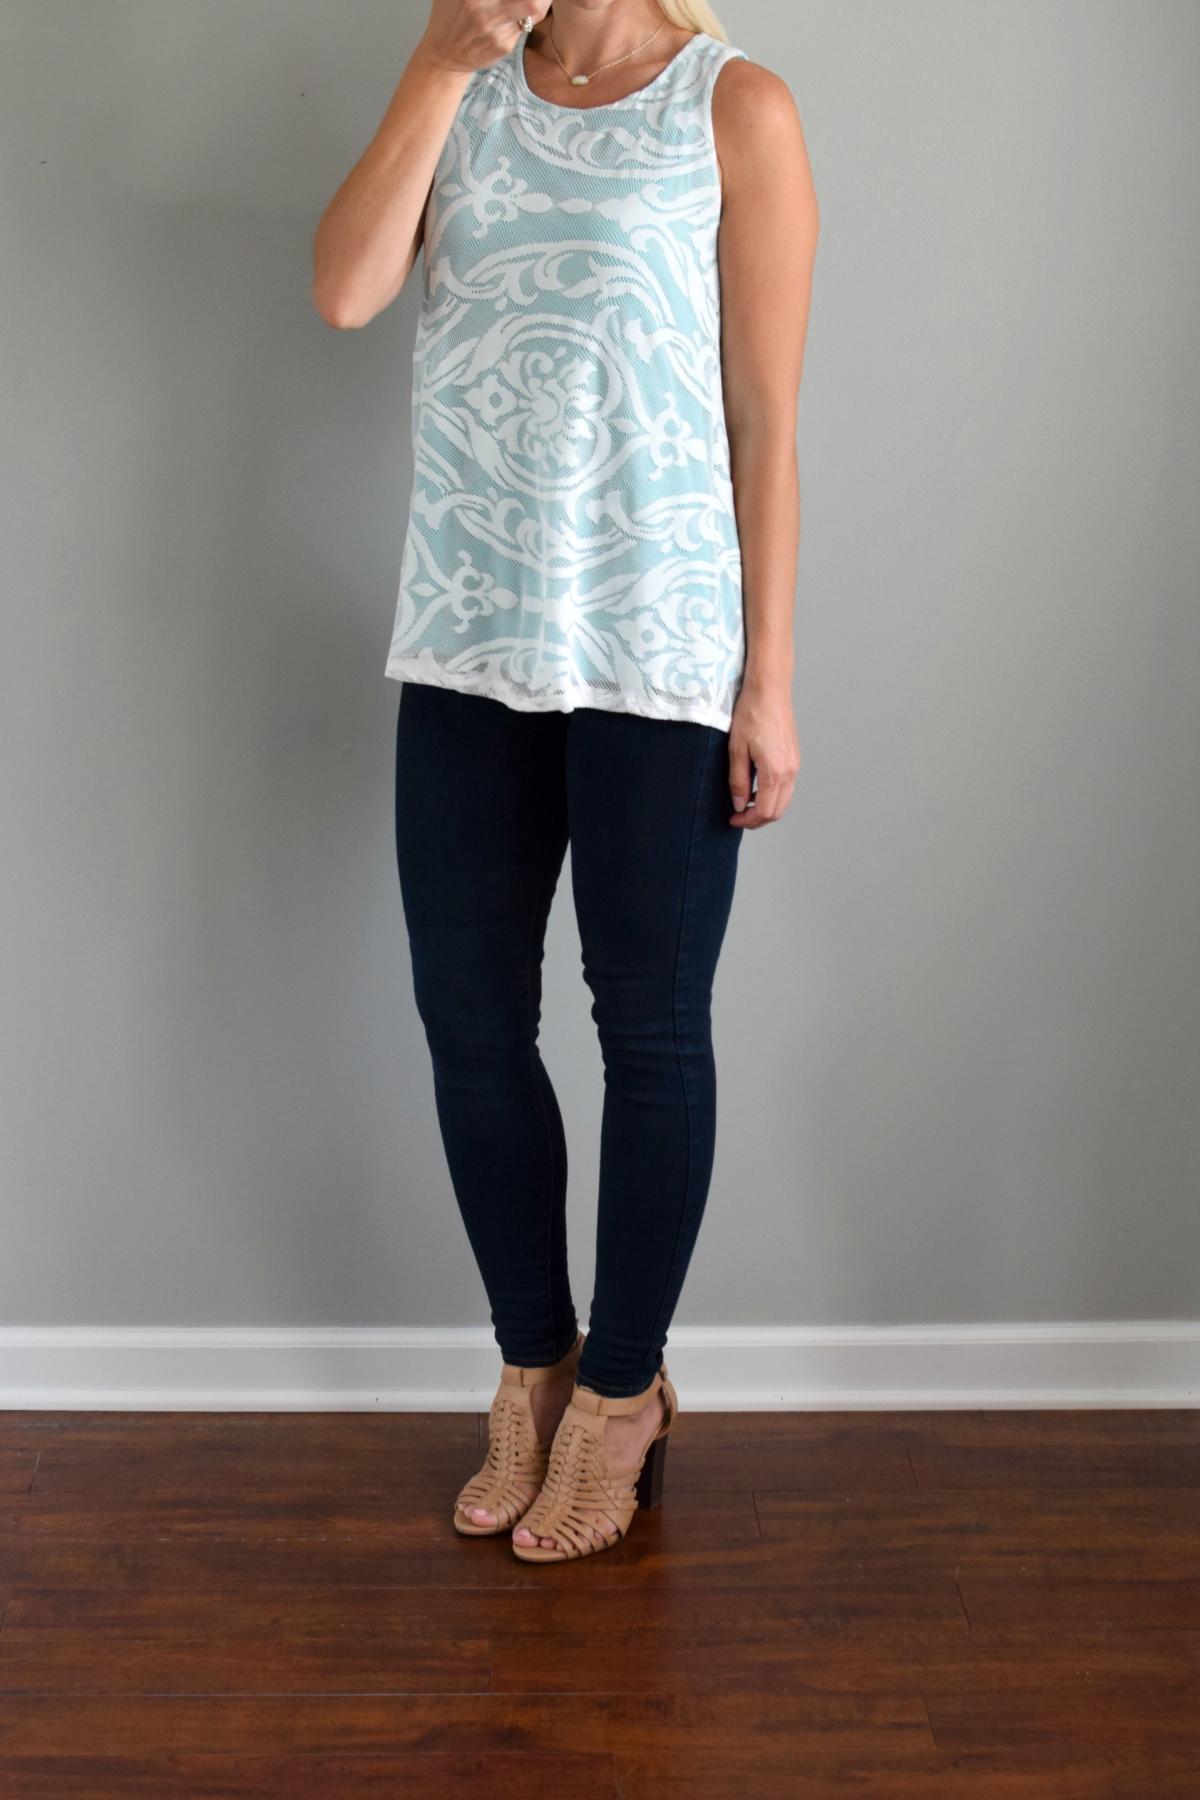 July 2016 Stitch Fix Review: Papermoon Veeta Lace Overlay Knit Top | www.pearlsandsportsbras.com |